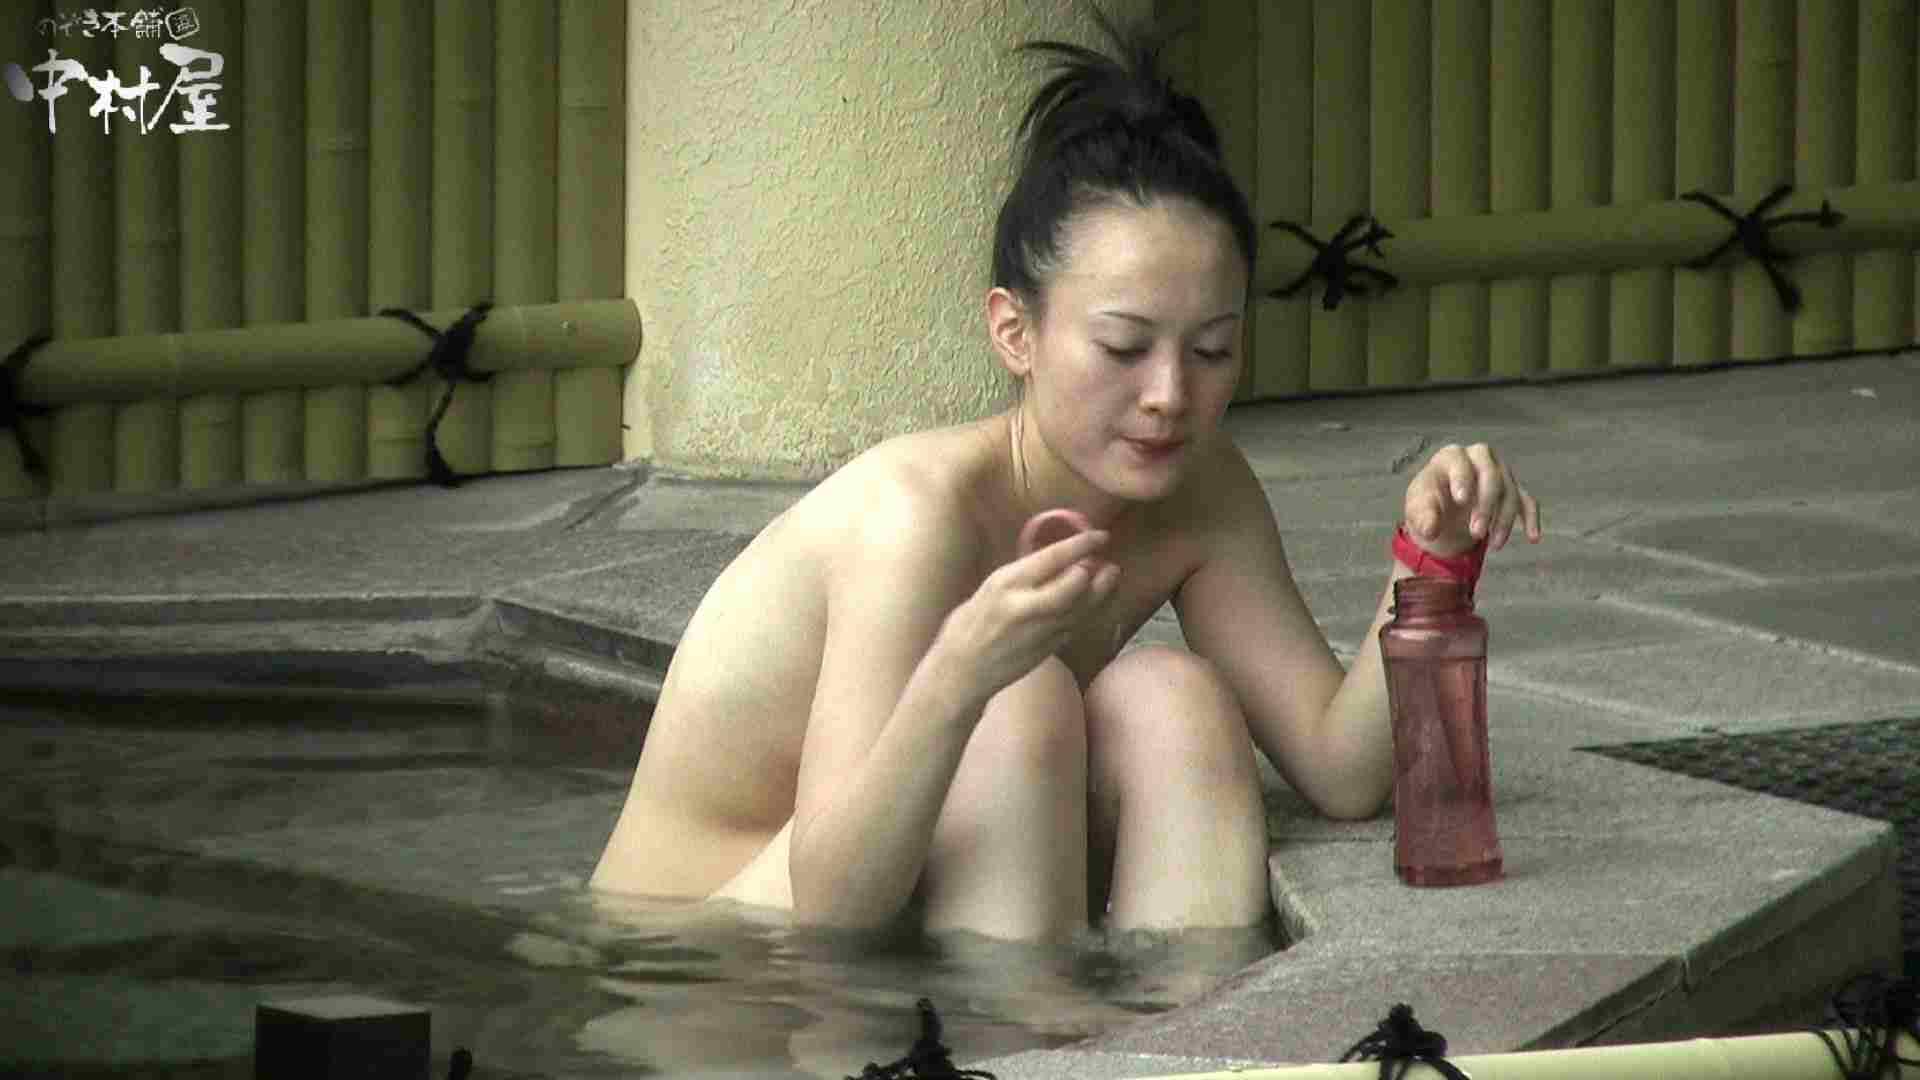 Aquaな露天風呂Vol.900 OLのエロ生活 すけべAV動画紹介 88連発 68